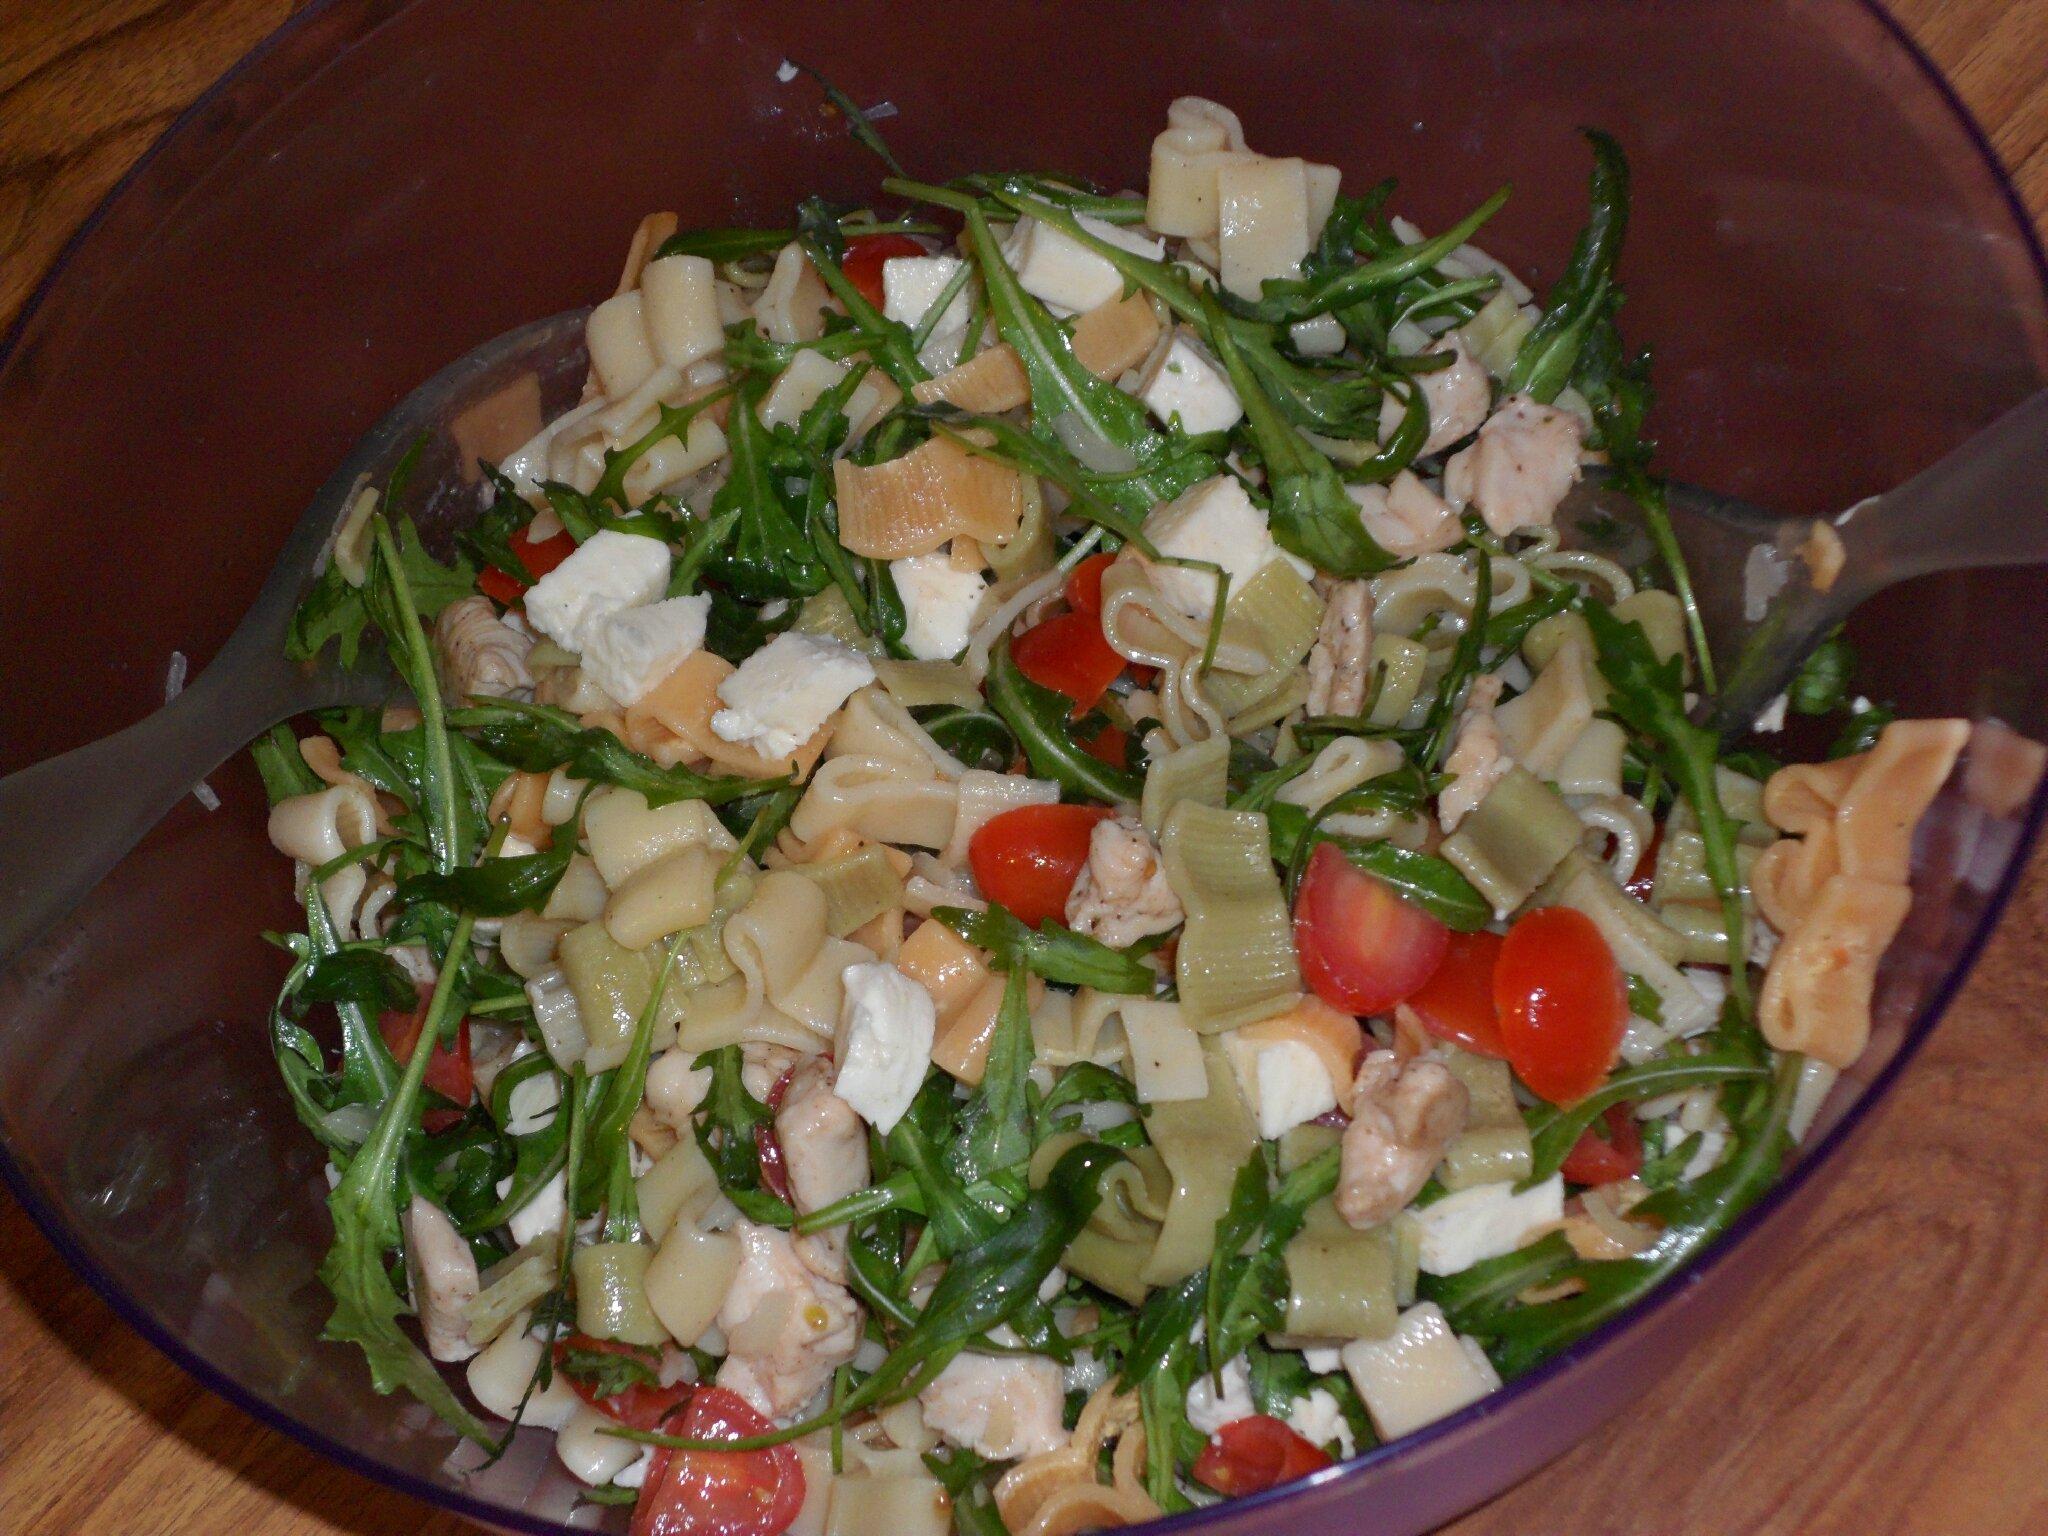 Salade de p tes poulet mozzarella sandy miam miam - Pate a la mozzarella ...